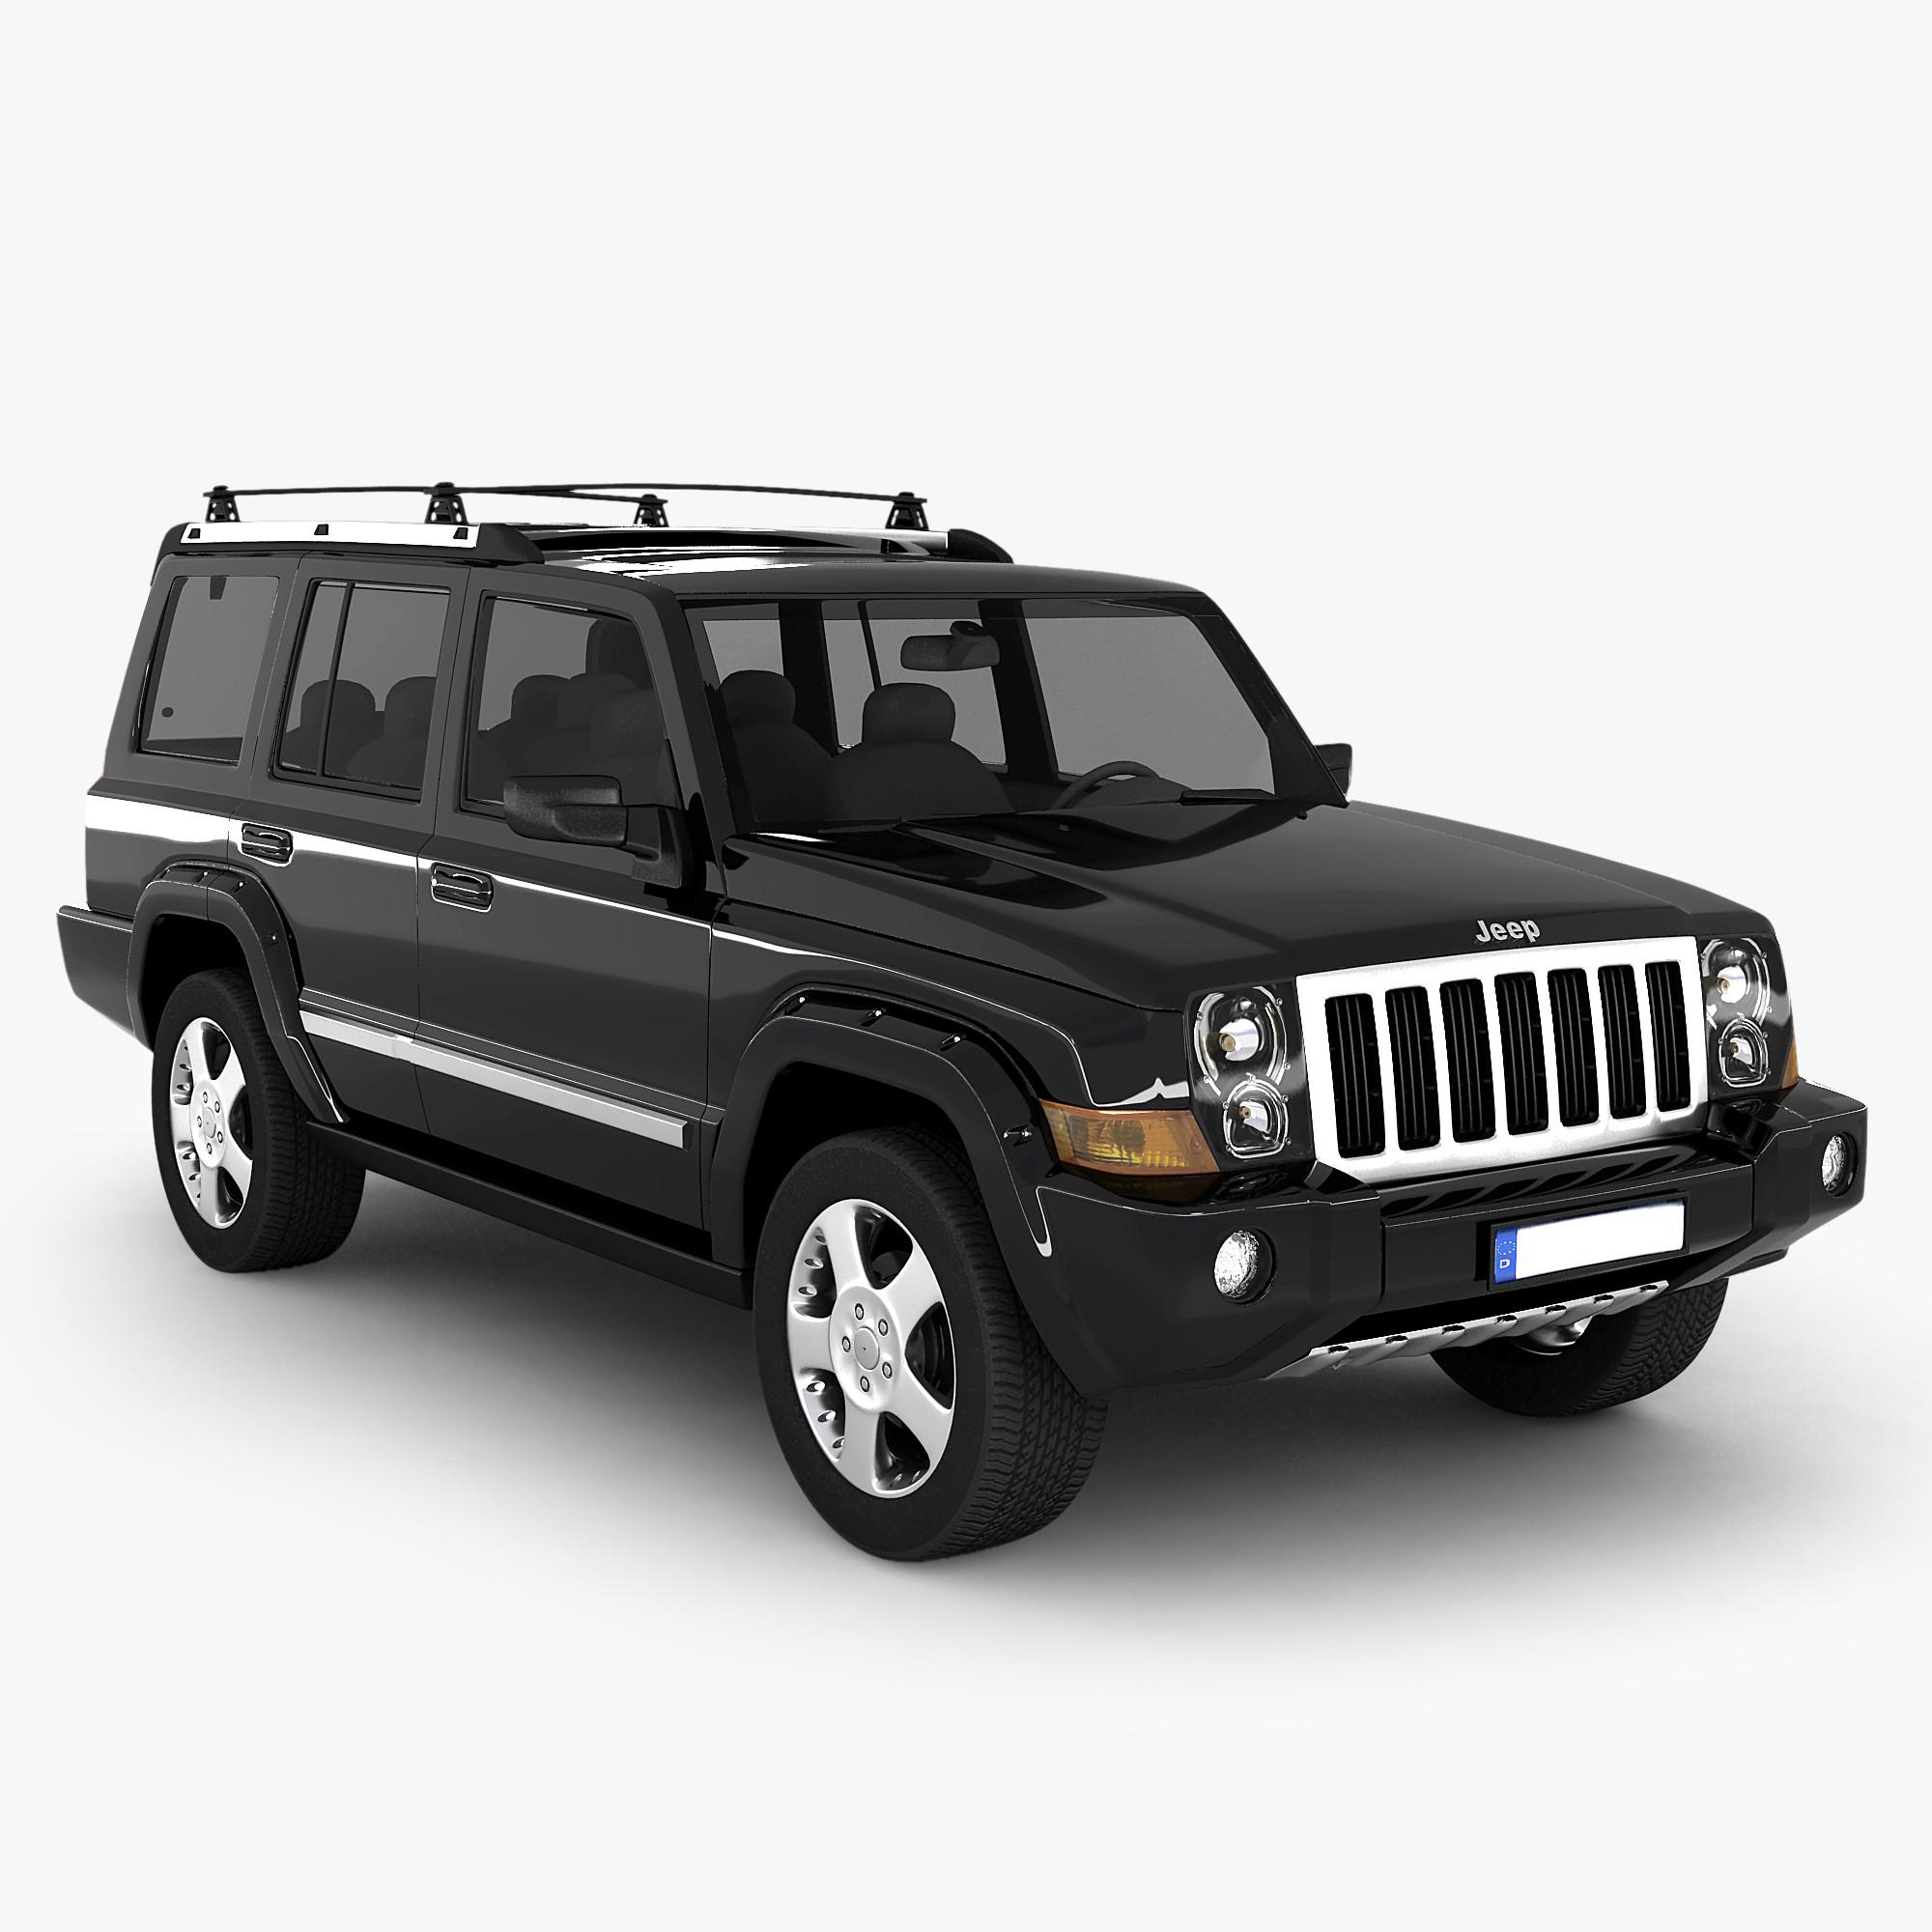 Jeep Commander 02 247.jpg